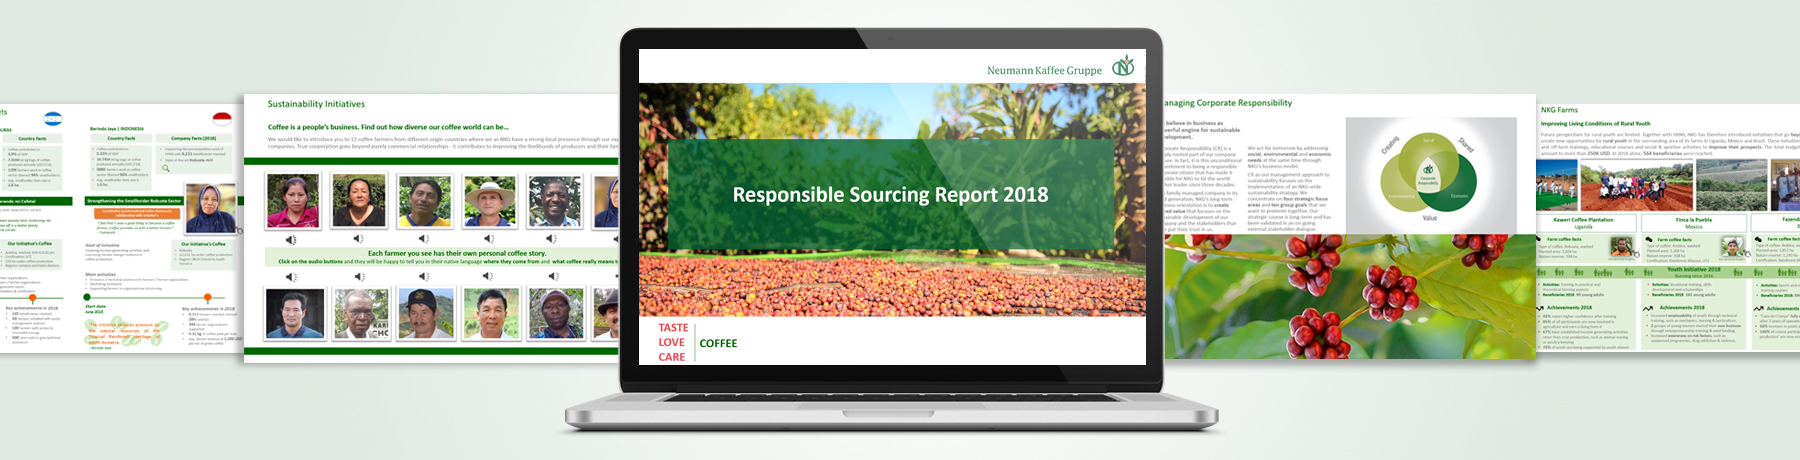 NKG 2018 Responsible Sourcing Report